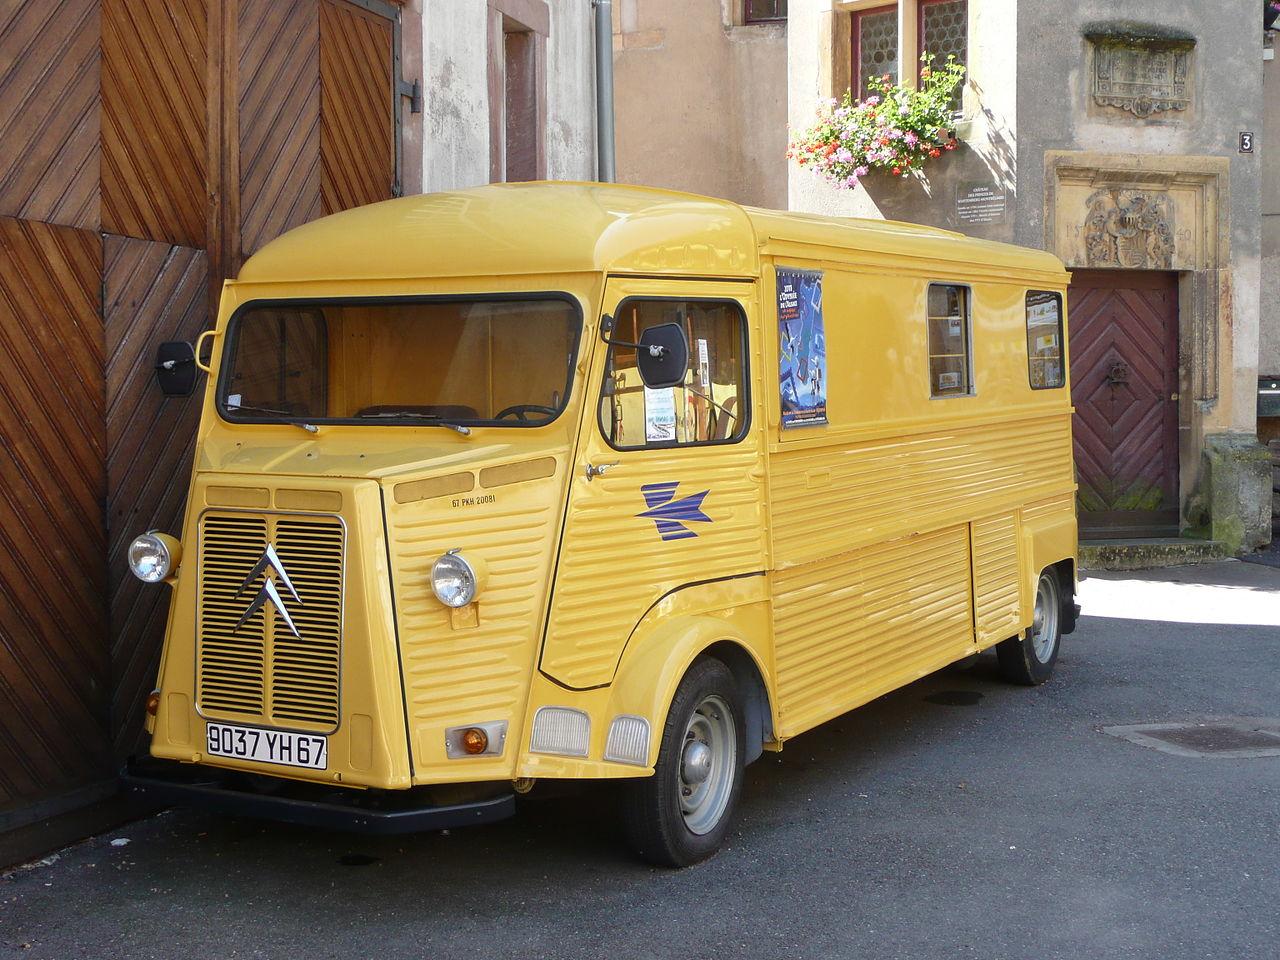 Vente Camping Car Rochefort